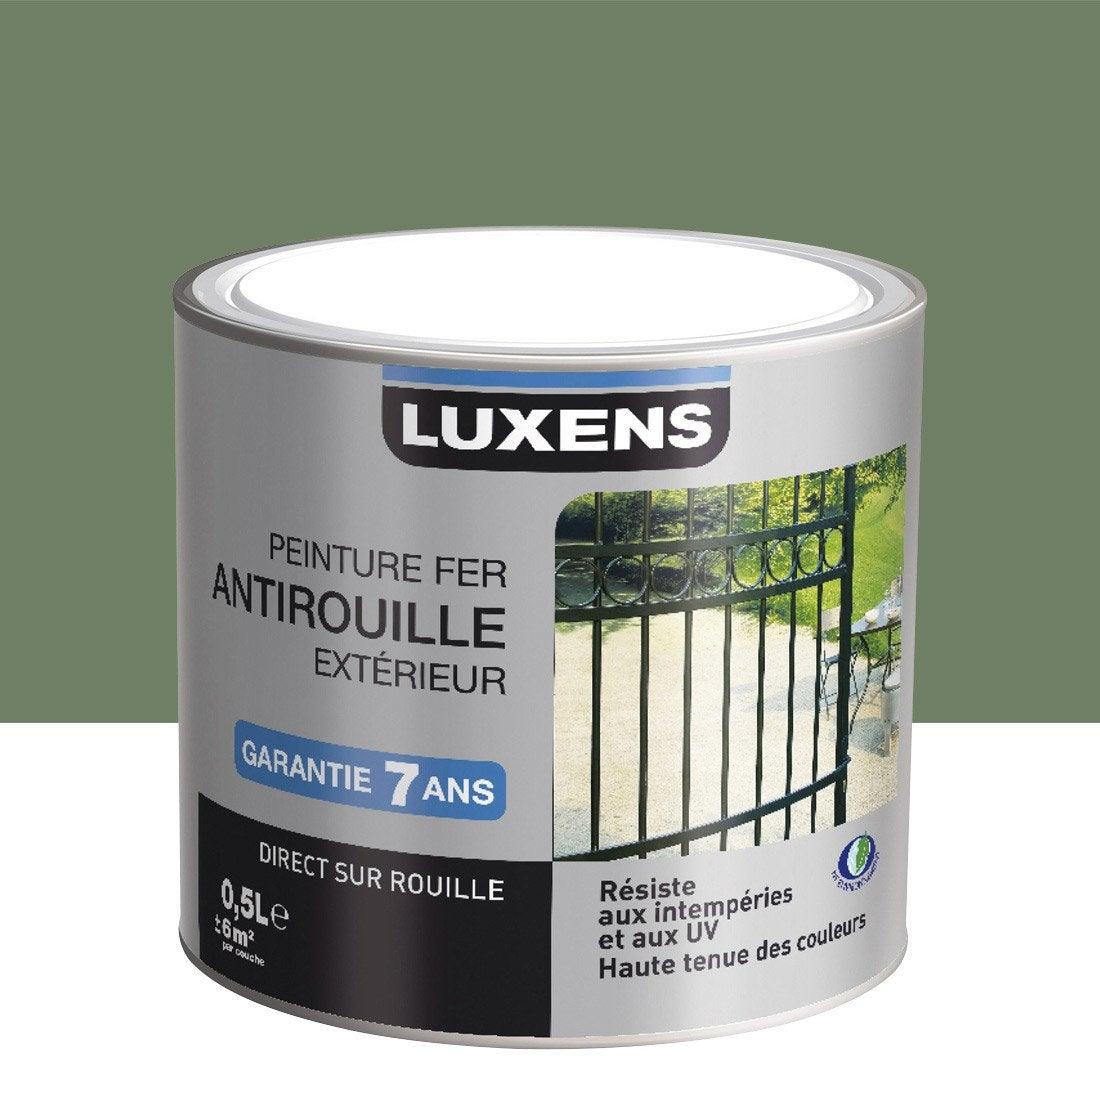 peinture fer ext rieur antirouille luxens vert olivier 0. Black Bedroom Furniture Sets. Home Design Ideas